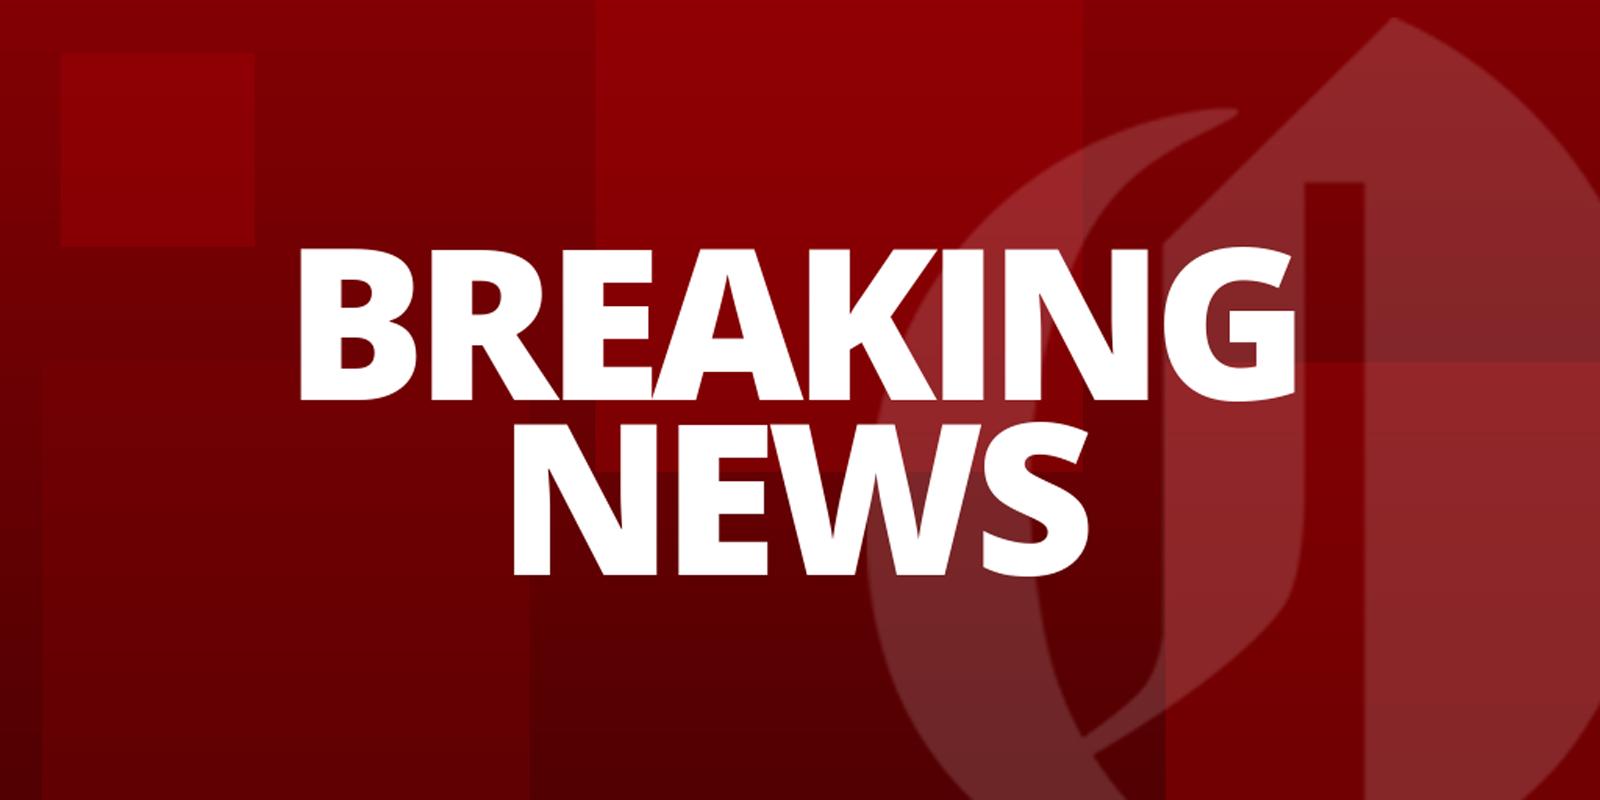 Sandy police arrest teen for making school shooting threat on social media